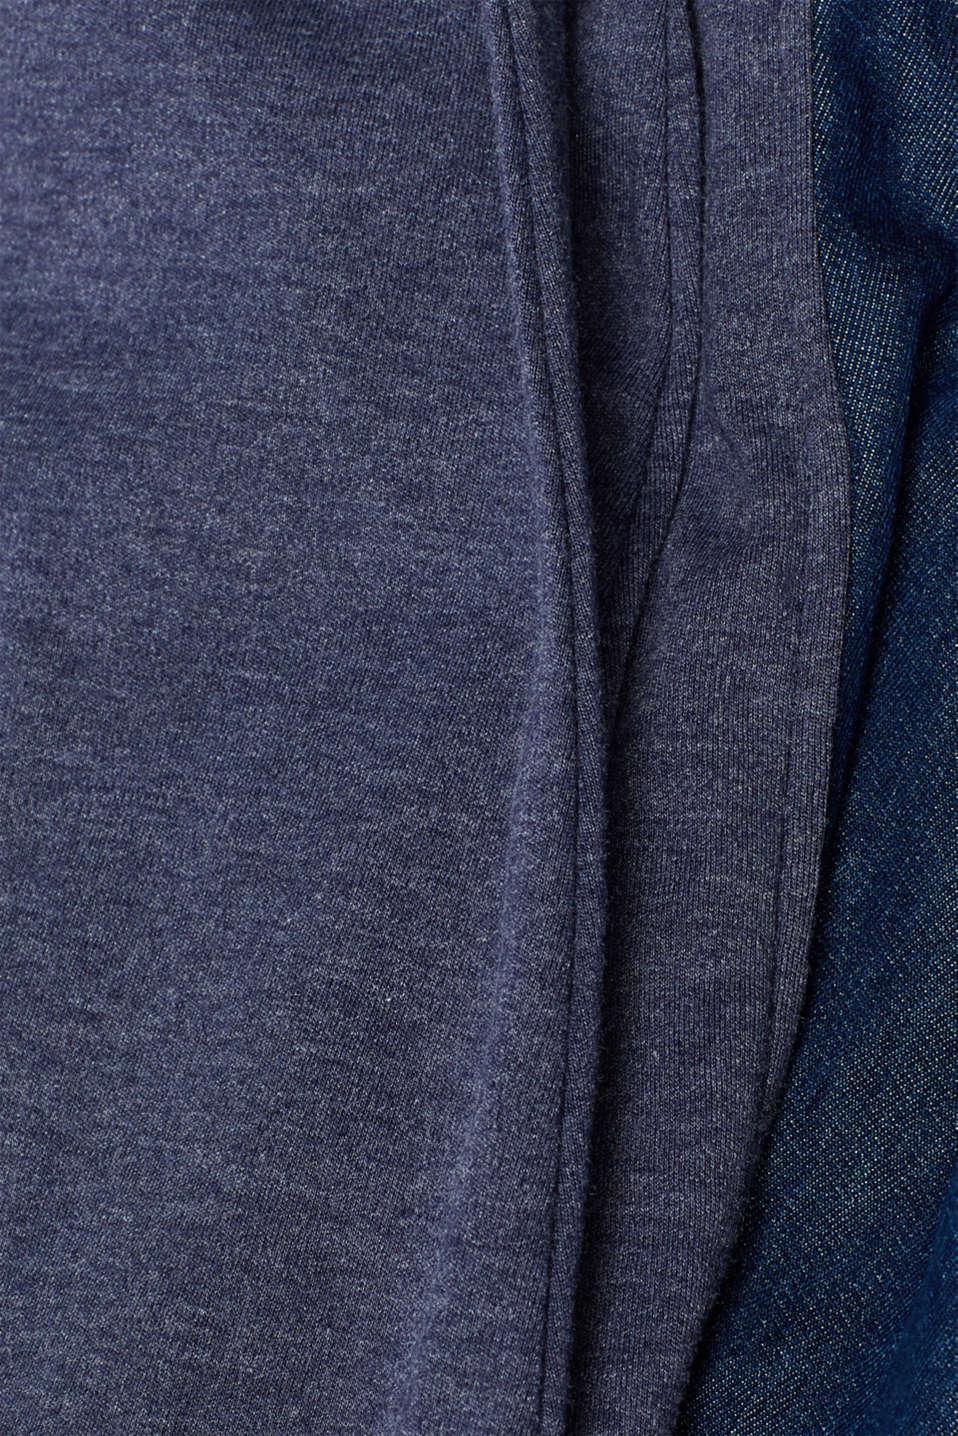 Jackets indoor woven, BLUE MEDIUM WASH, detail image number 2